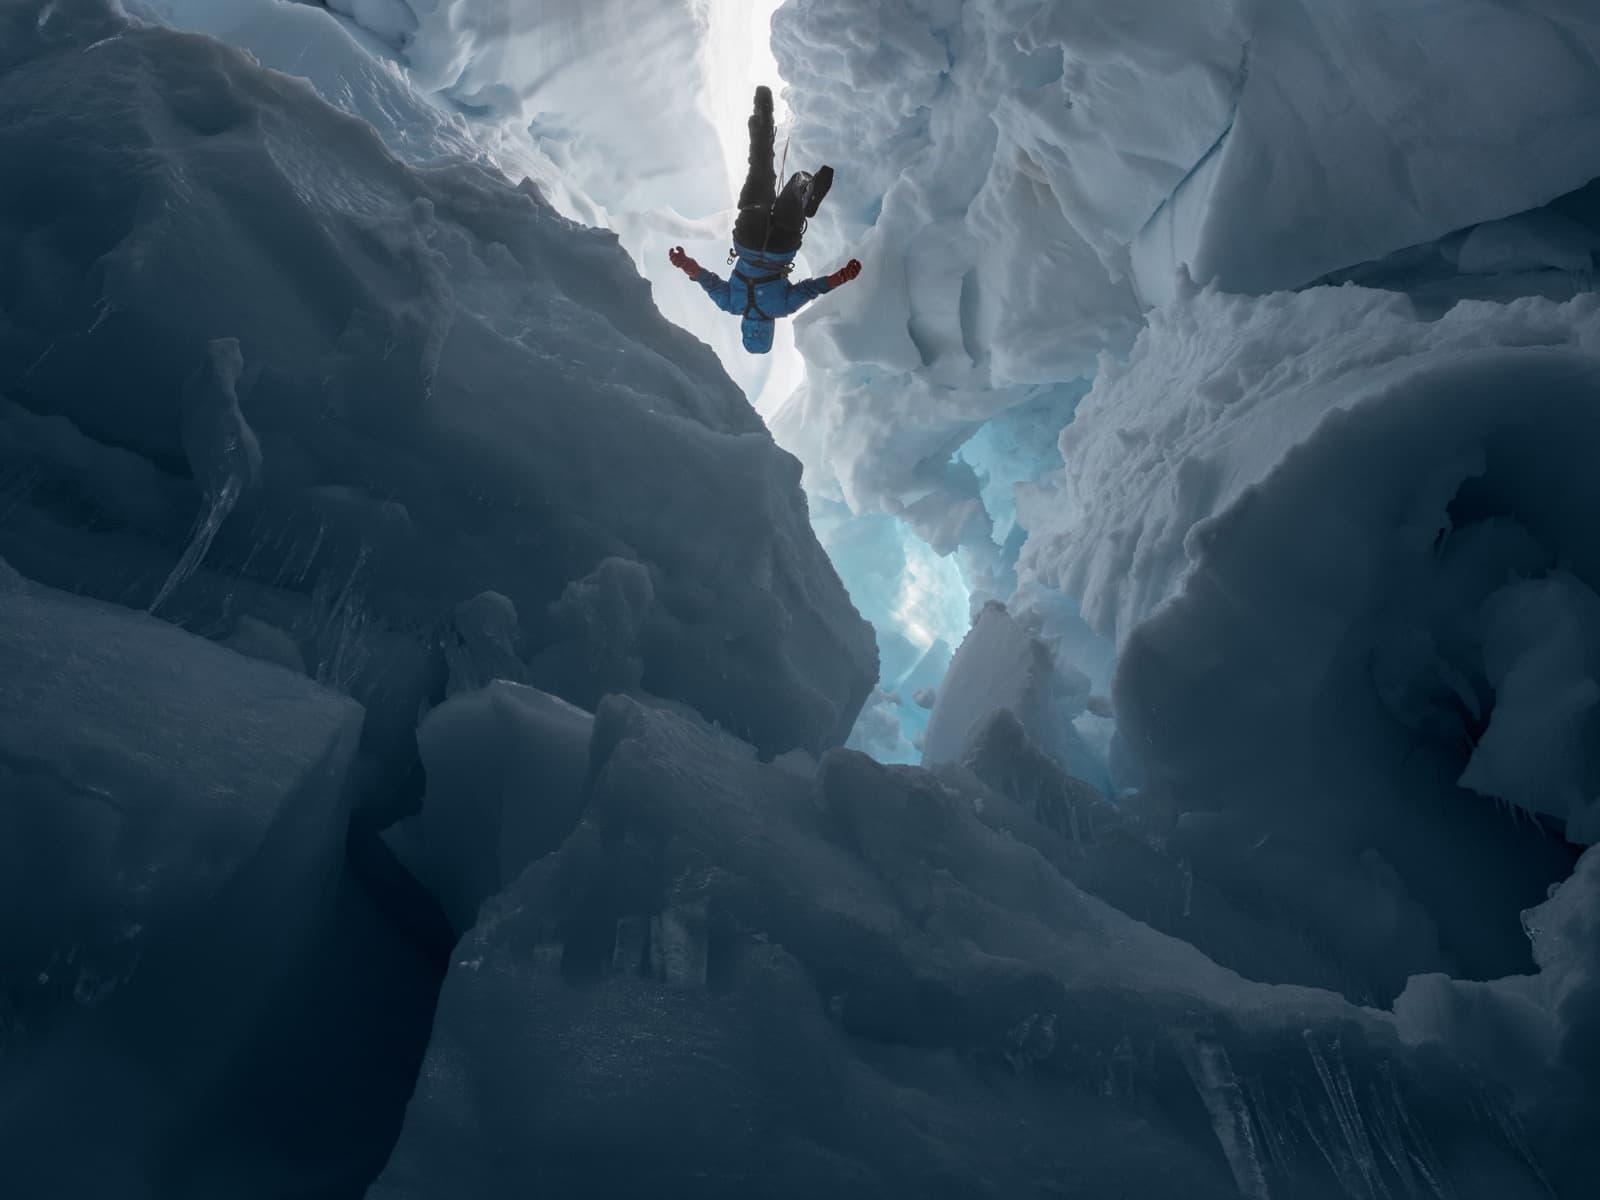 Lucas Foglia – Human Nature – Kenzie inside a melting glacier